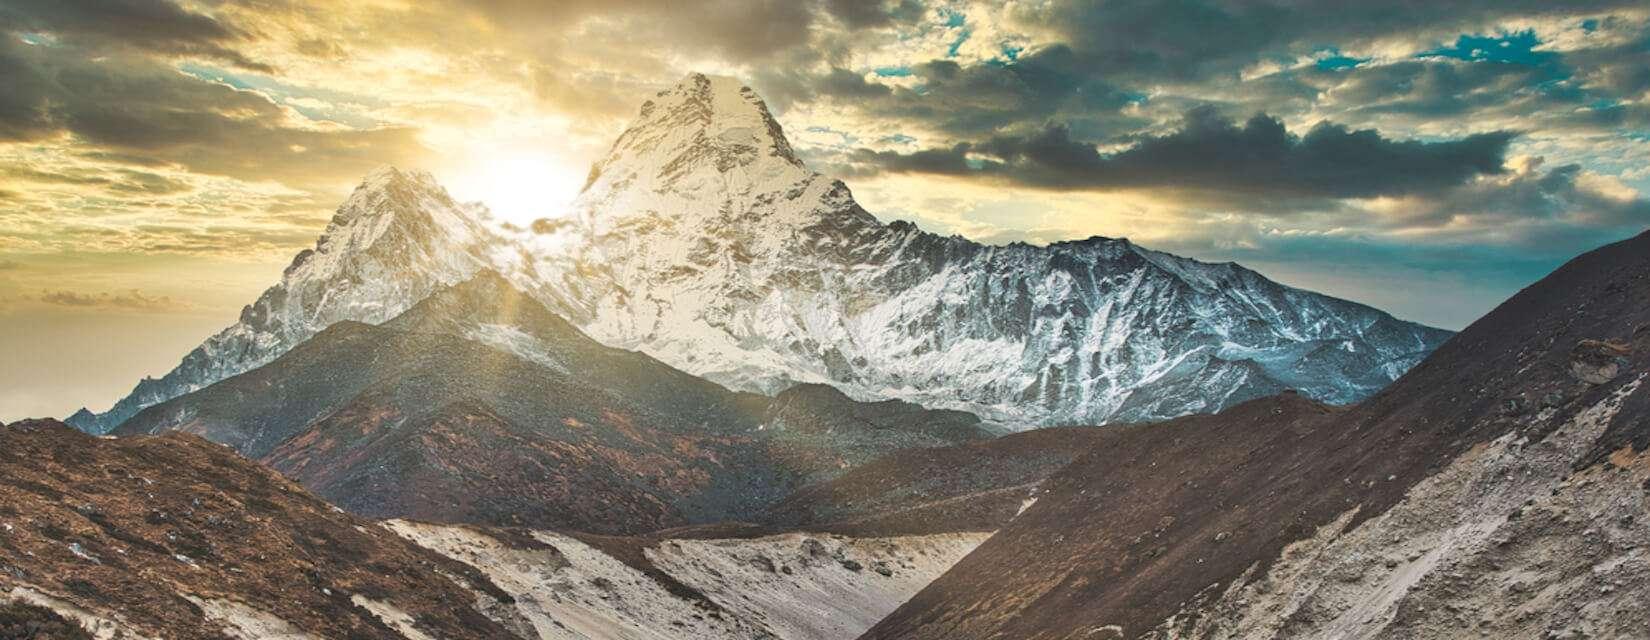 Luxury Everest Base Camp Trek Cost